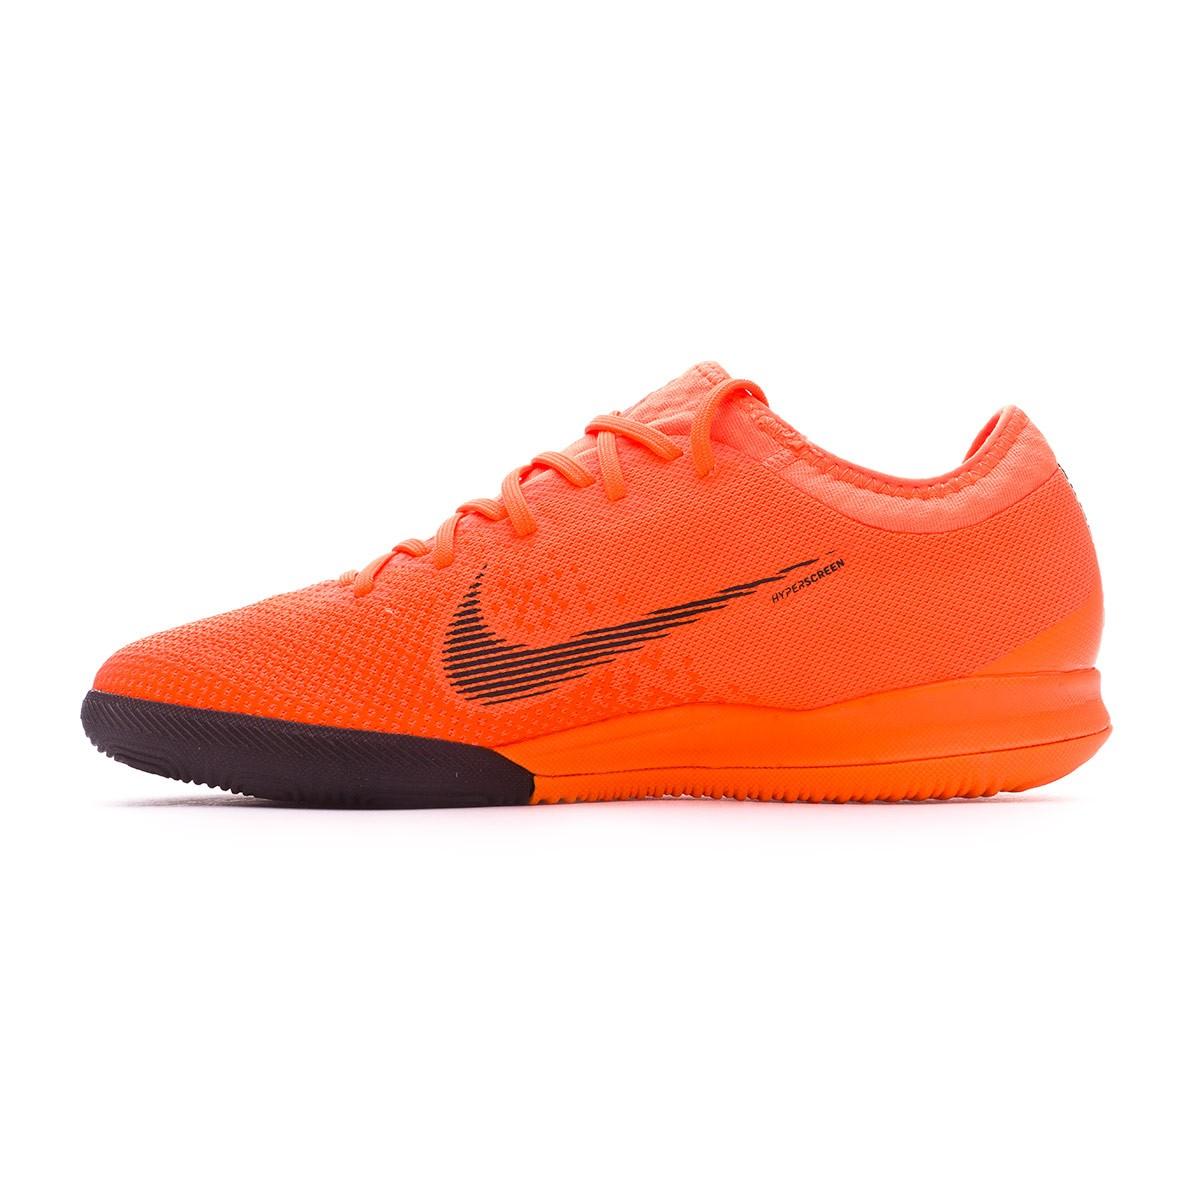 7378fee59 Futsal Boot Nike Mercurial VaporX XII Pro IC Total orange-Black-Volt -  Football store Fútbol Emotion